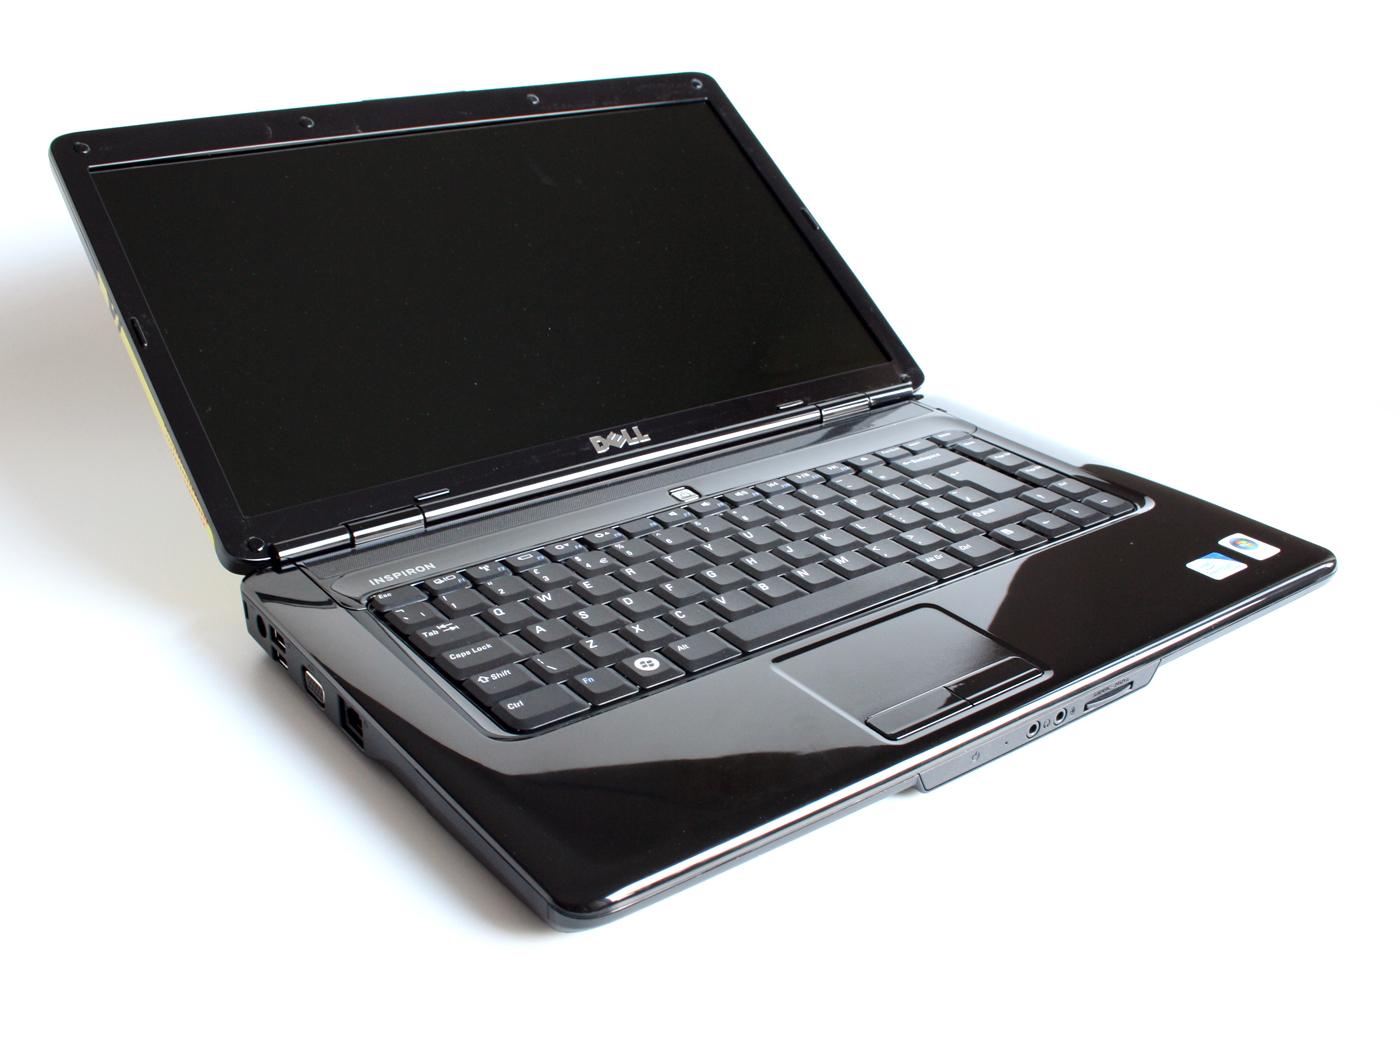 Pp41l dell laptop